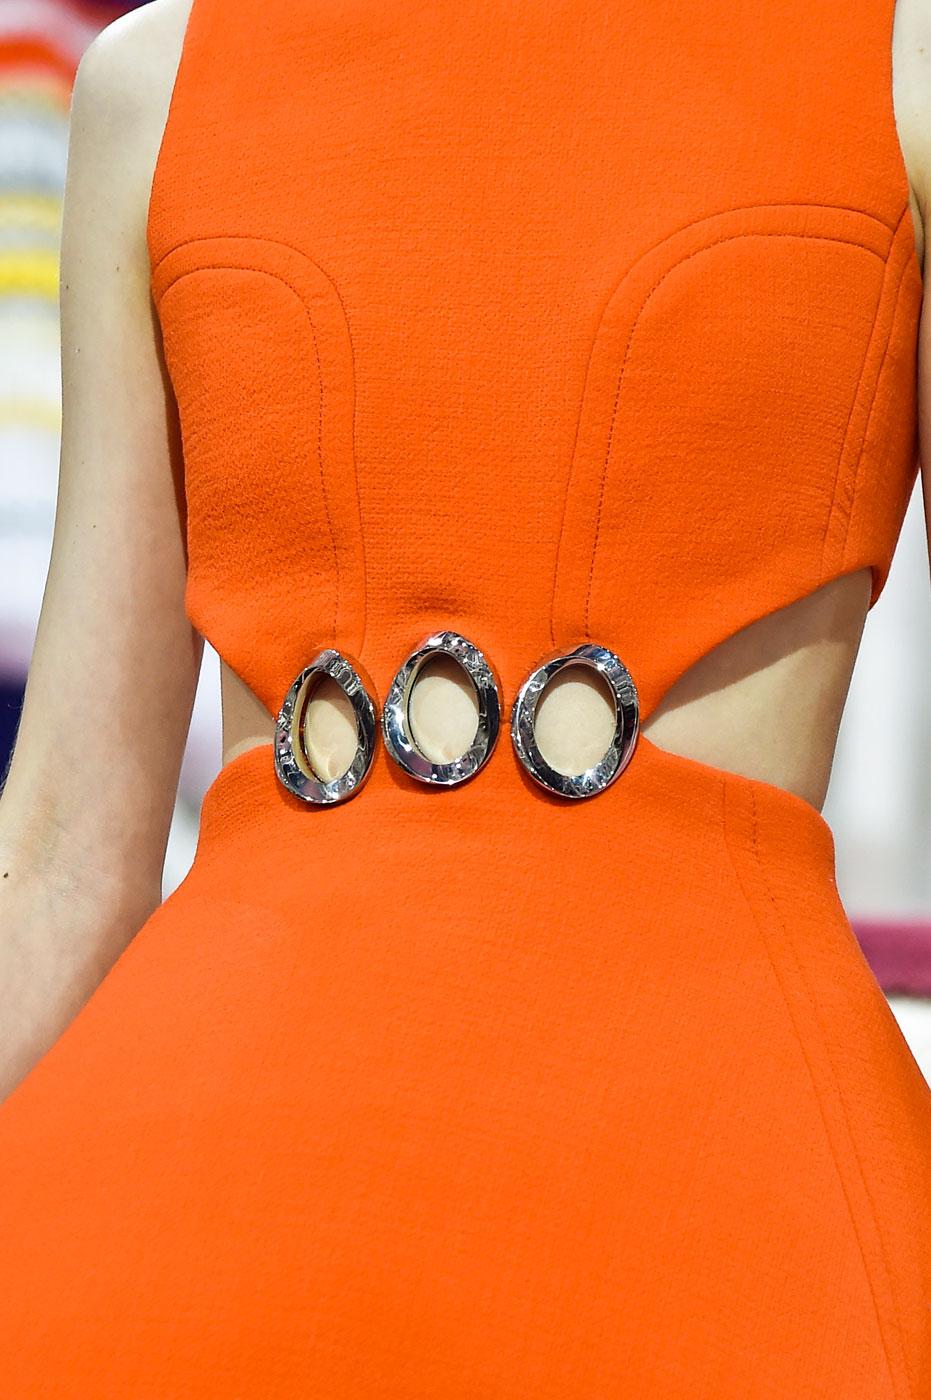 Christian-Dior-fashion-runway-show-close-ups-haute-couture-paris-spring-summer-2015-the-impression-121